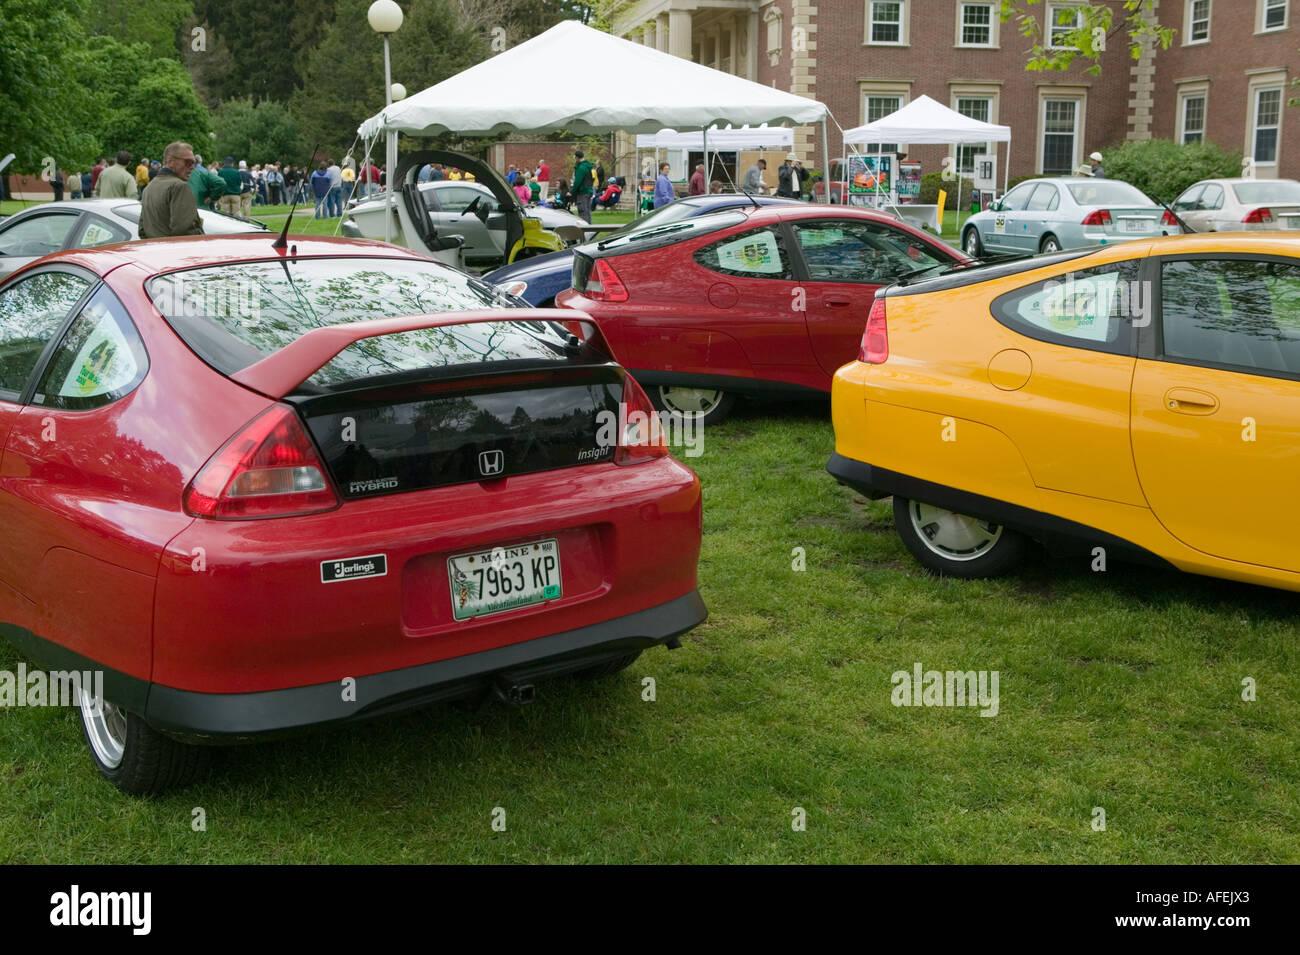 Los coches híbridos en tour de Sol Saratoga Springs New York Imagen De Stock